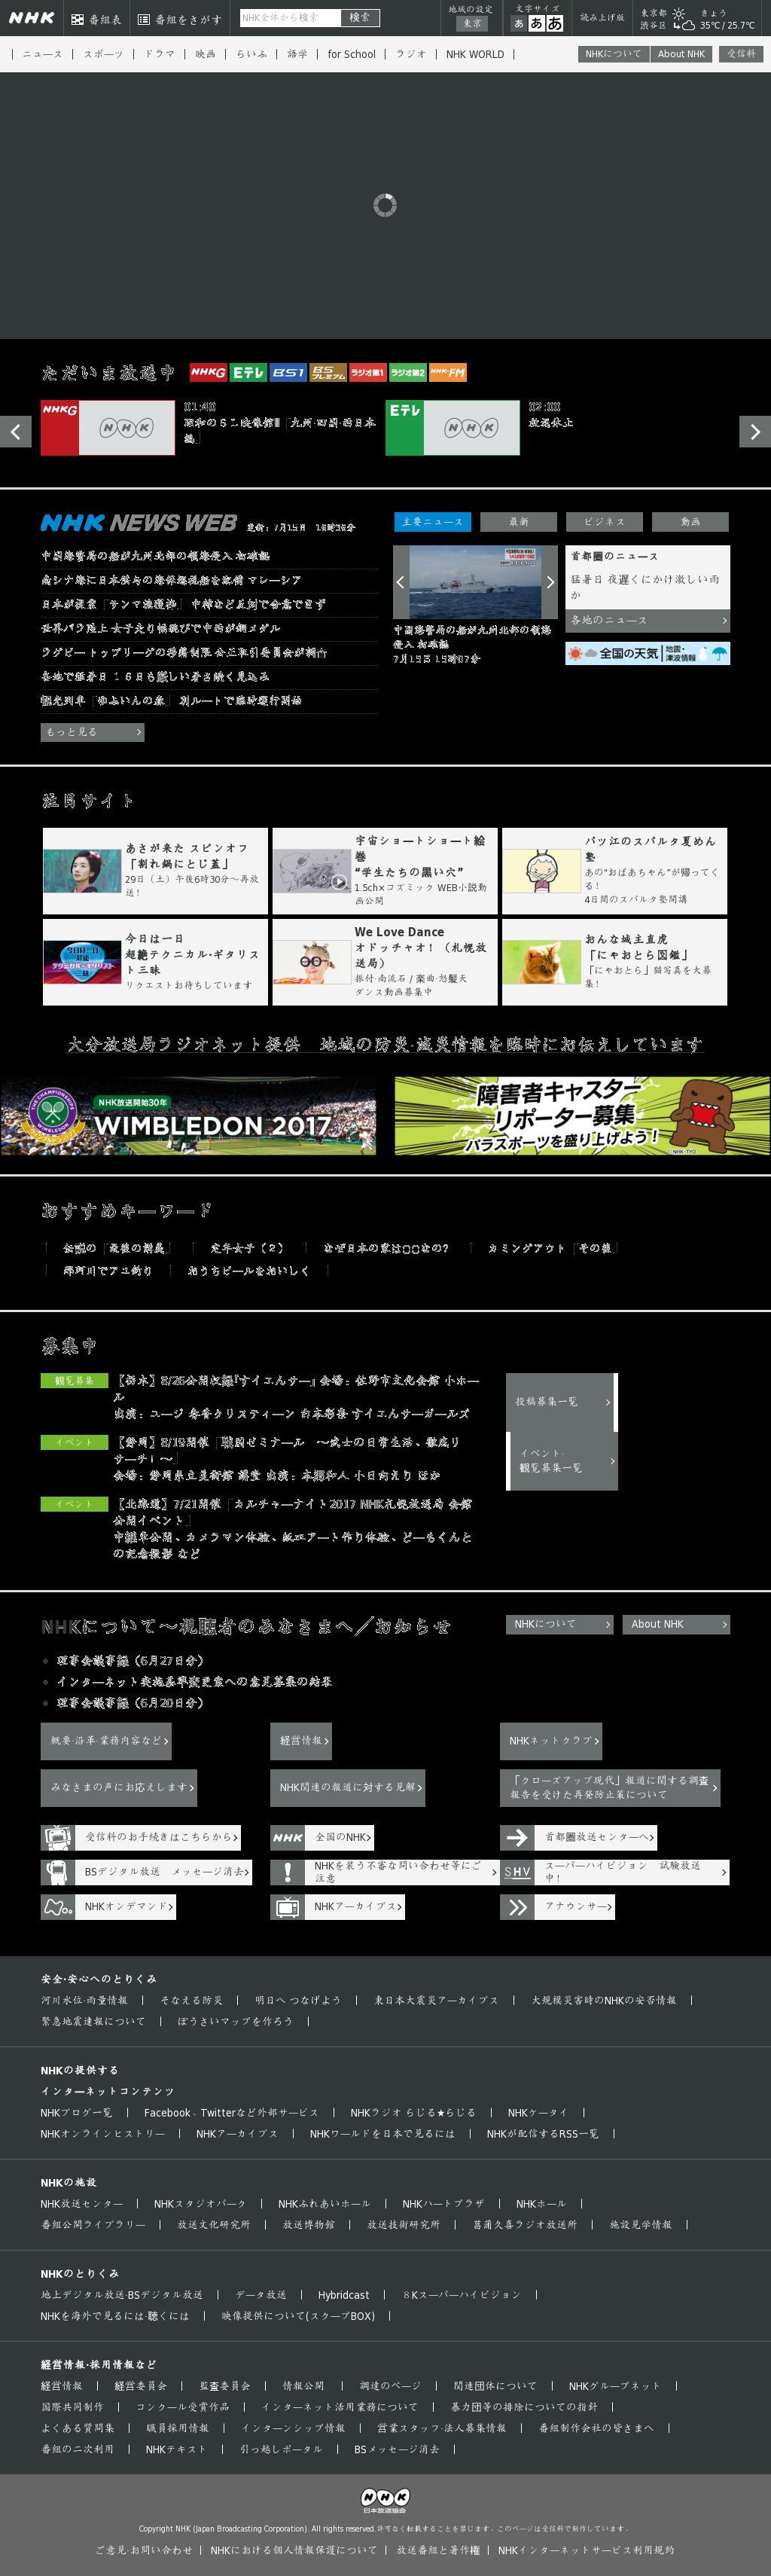 NHK Online at Saturday July 15, 2017, 5:16 p.m. UTC